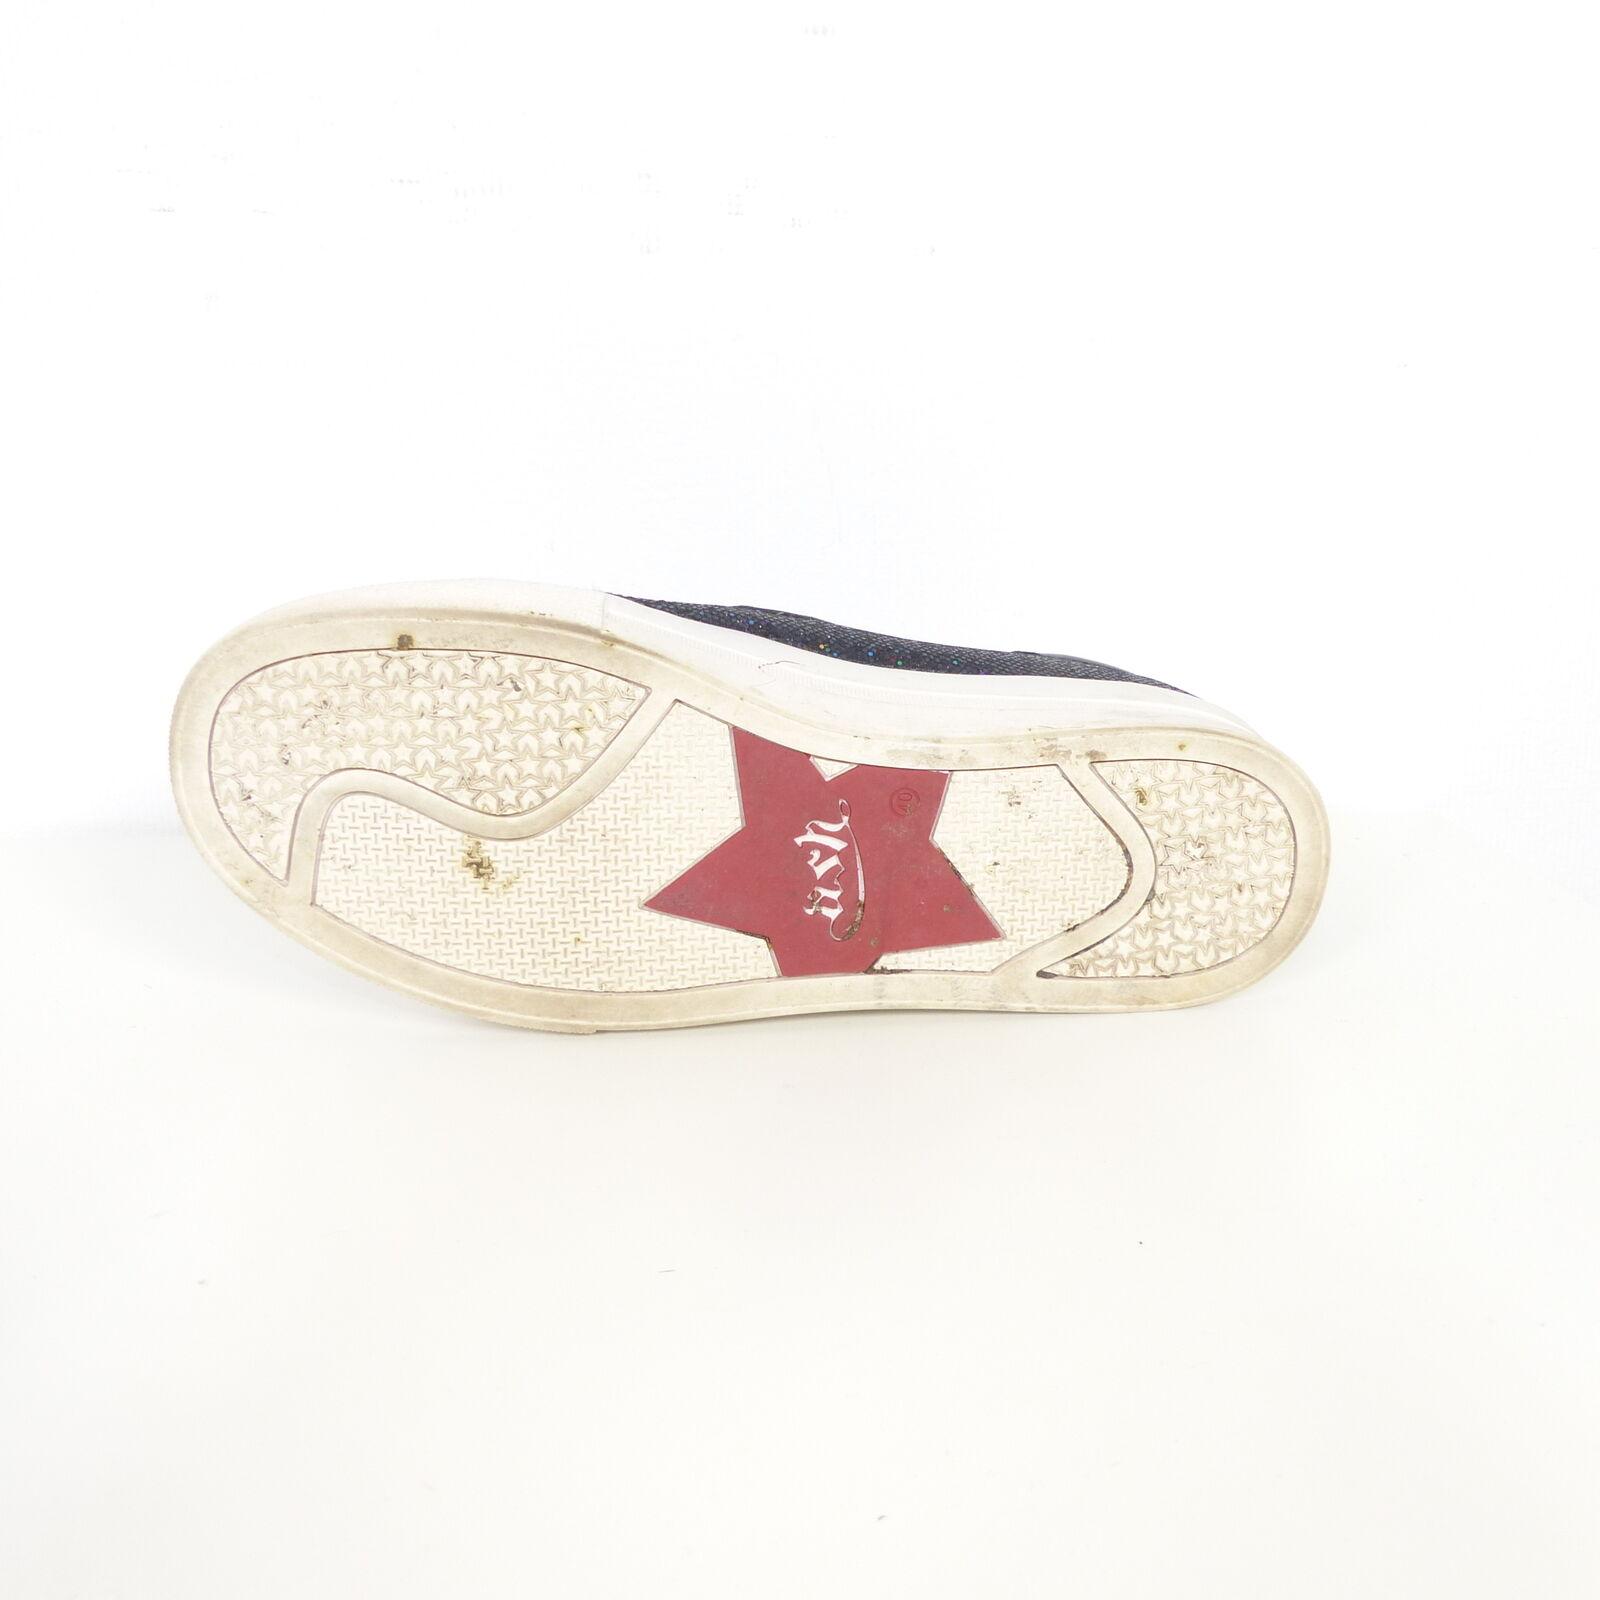 ASH ASH ASH Sneaker Turnschuhe Glitzer black Bunt Gr. EUR 40 d166fd